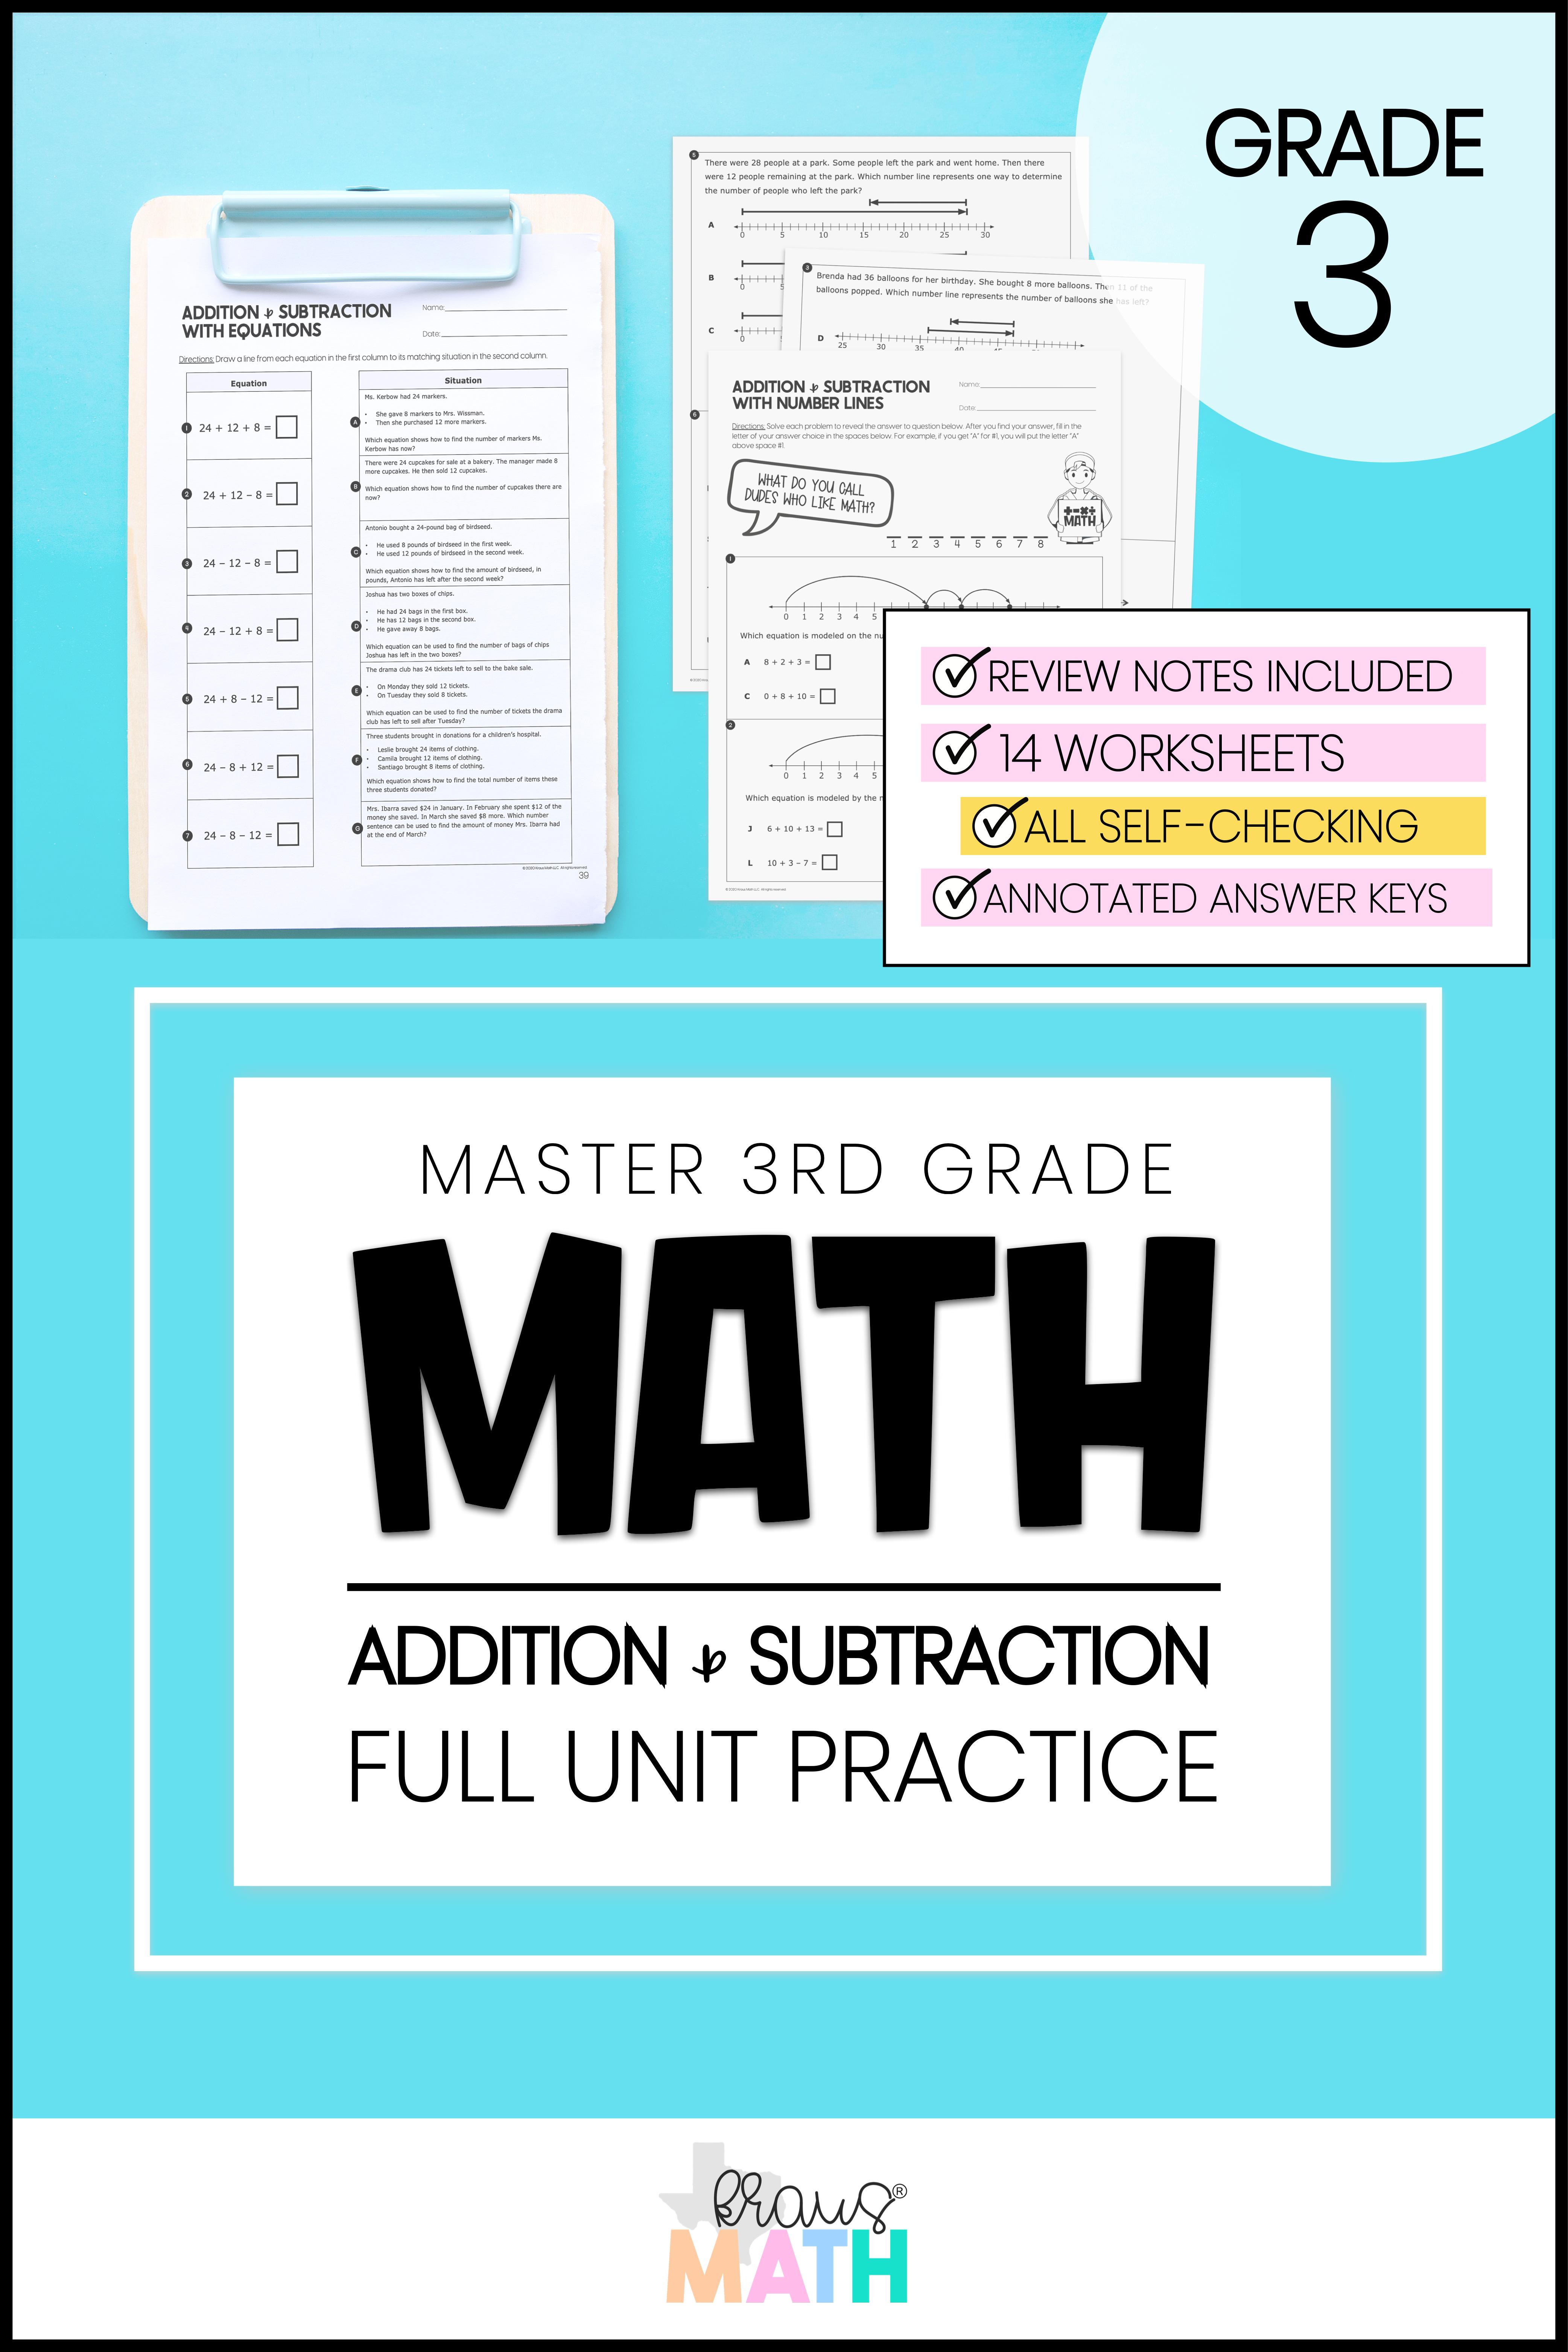 At Home Learning Archives Kraus Math 3rd Grade Math Math Packets Elementary Math [ 6250 x 4167 Pixel ]